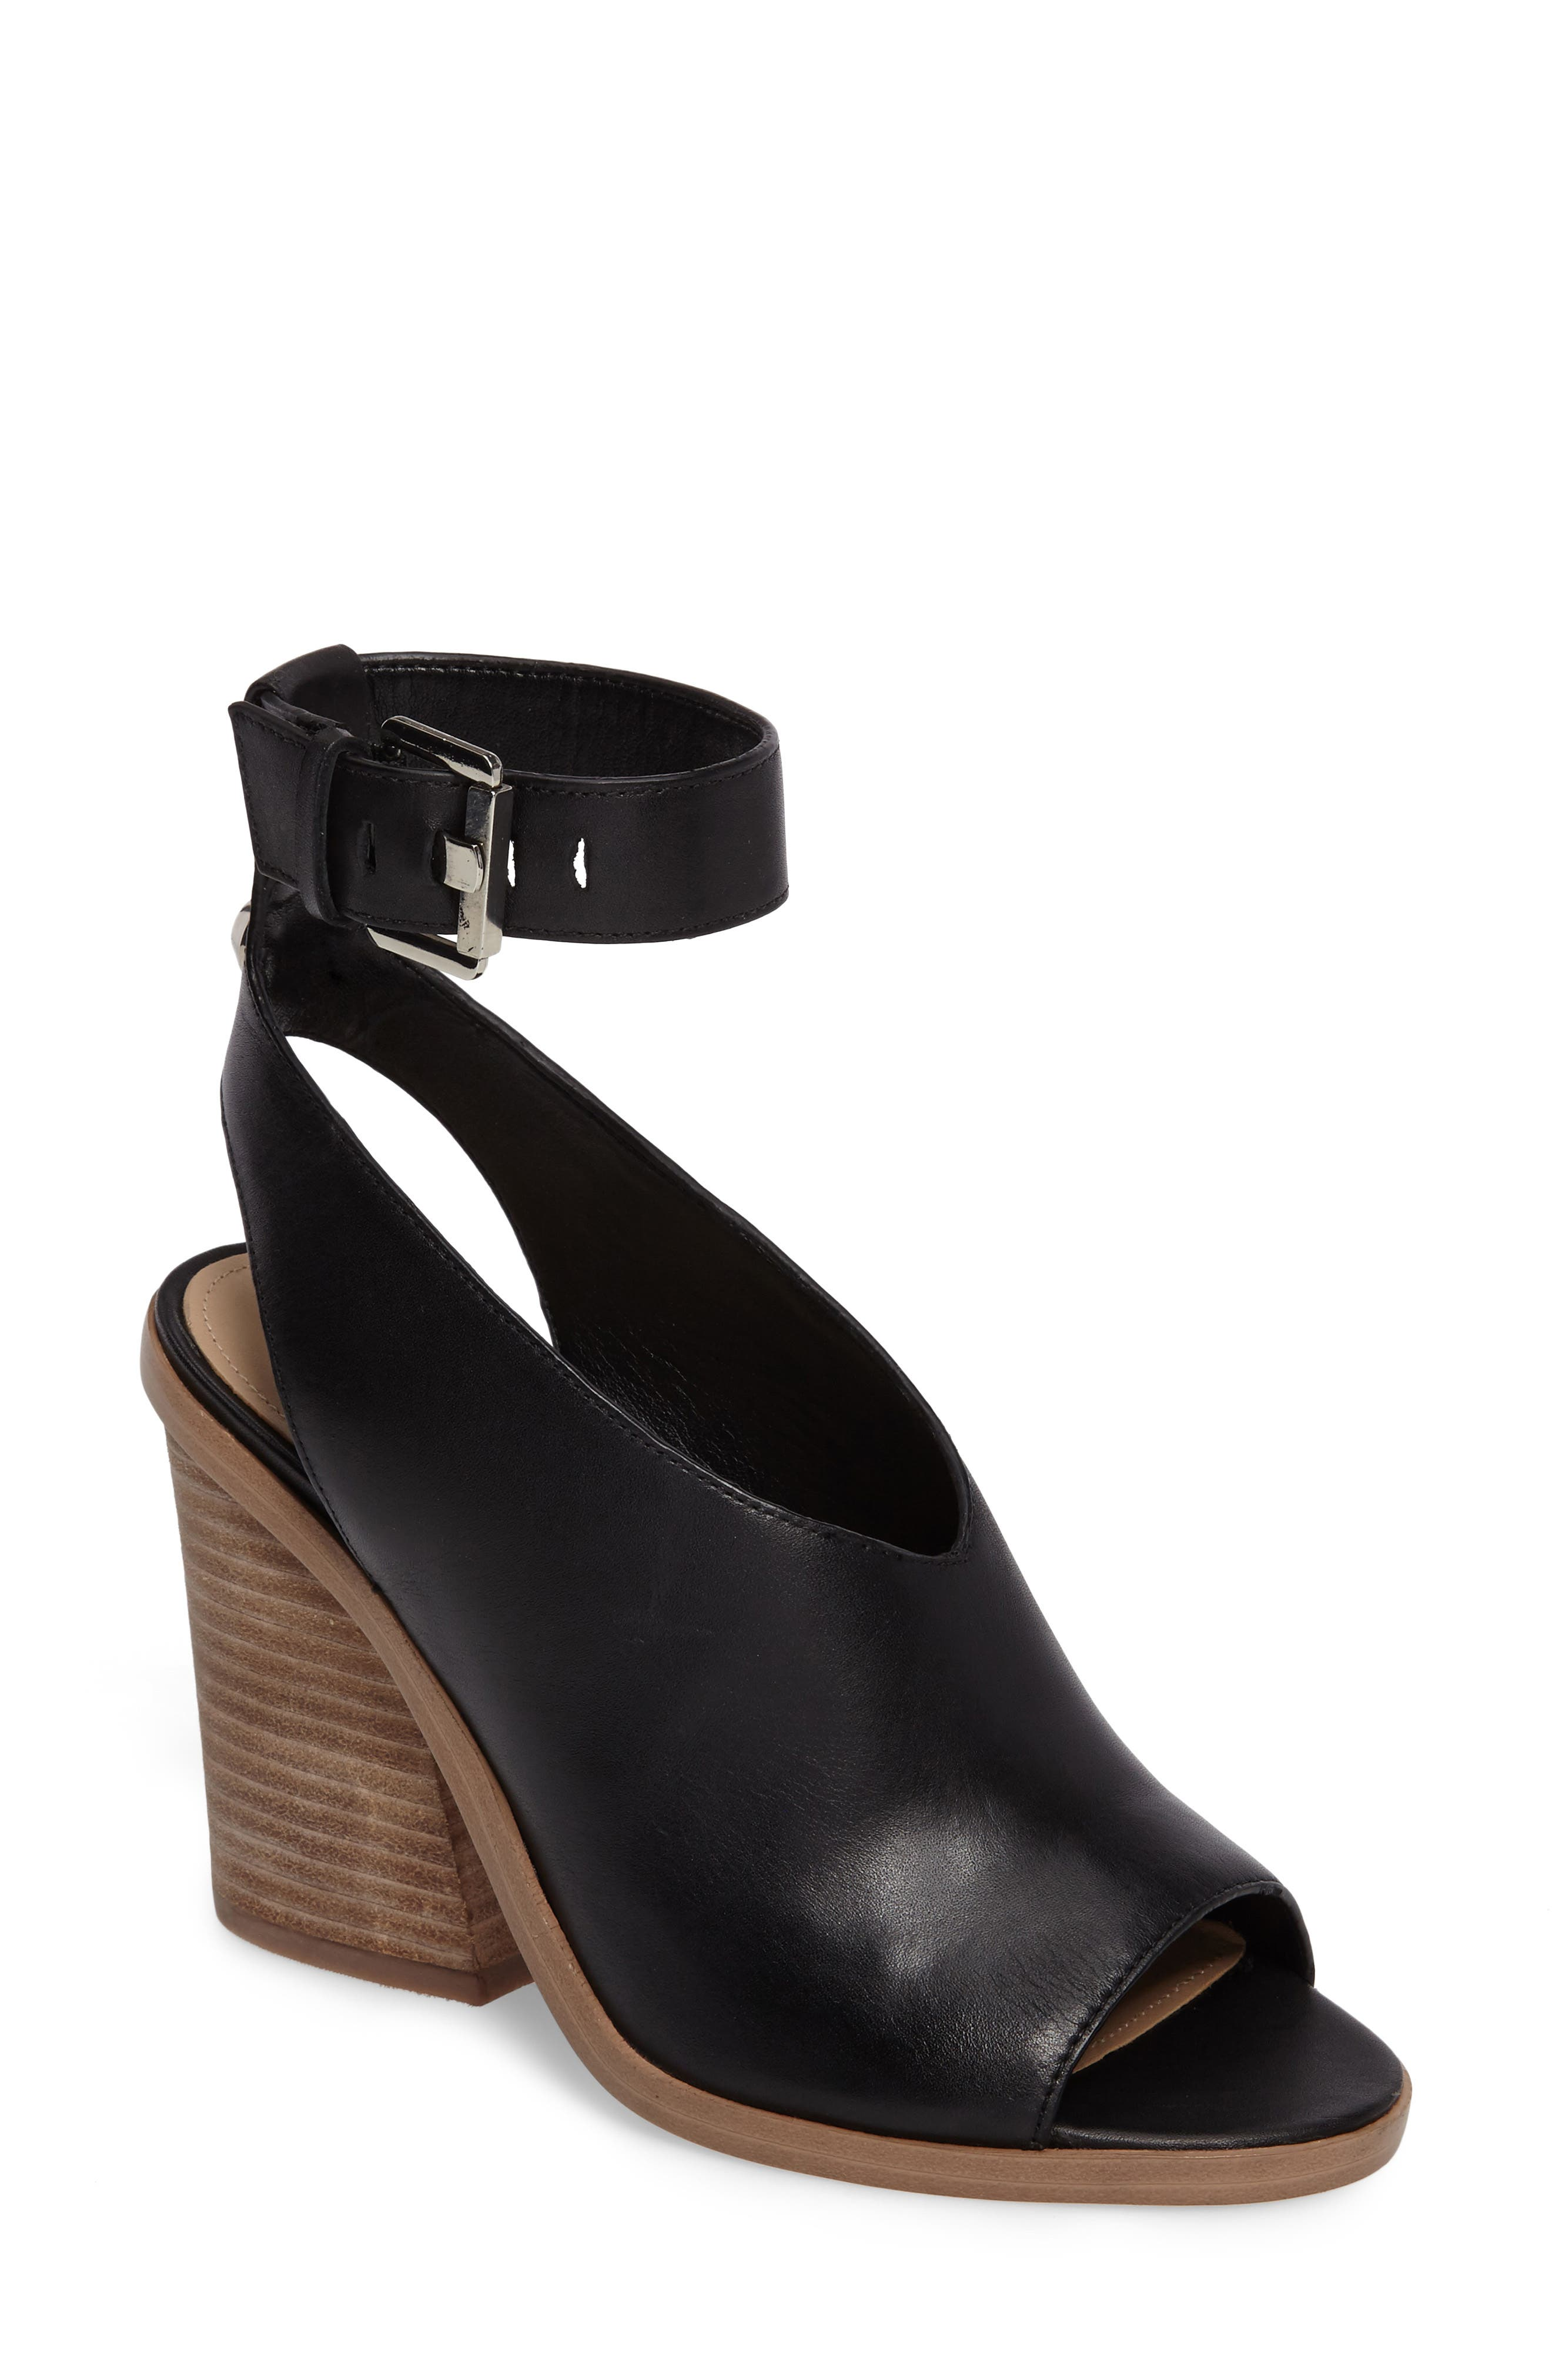 Main Image - Marc Fisher LTD Vidal Ankle Strap Sandal (Women)